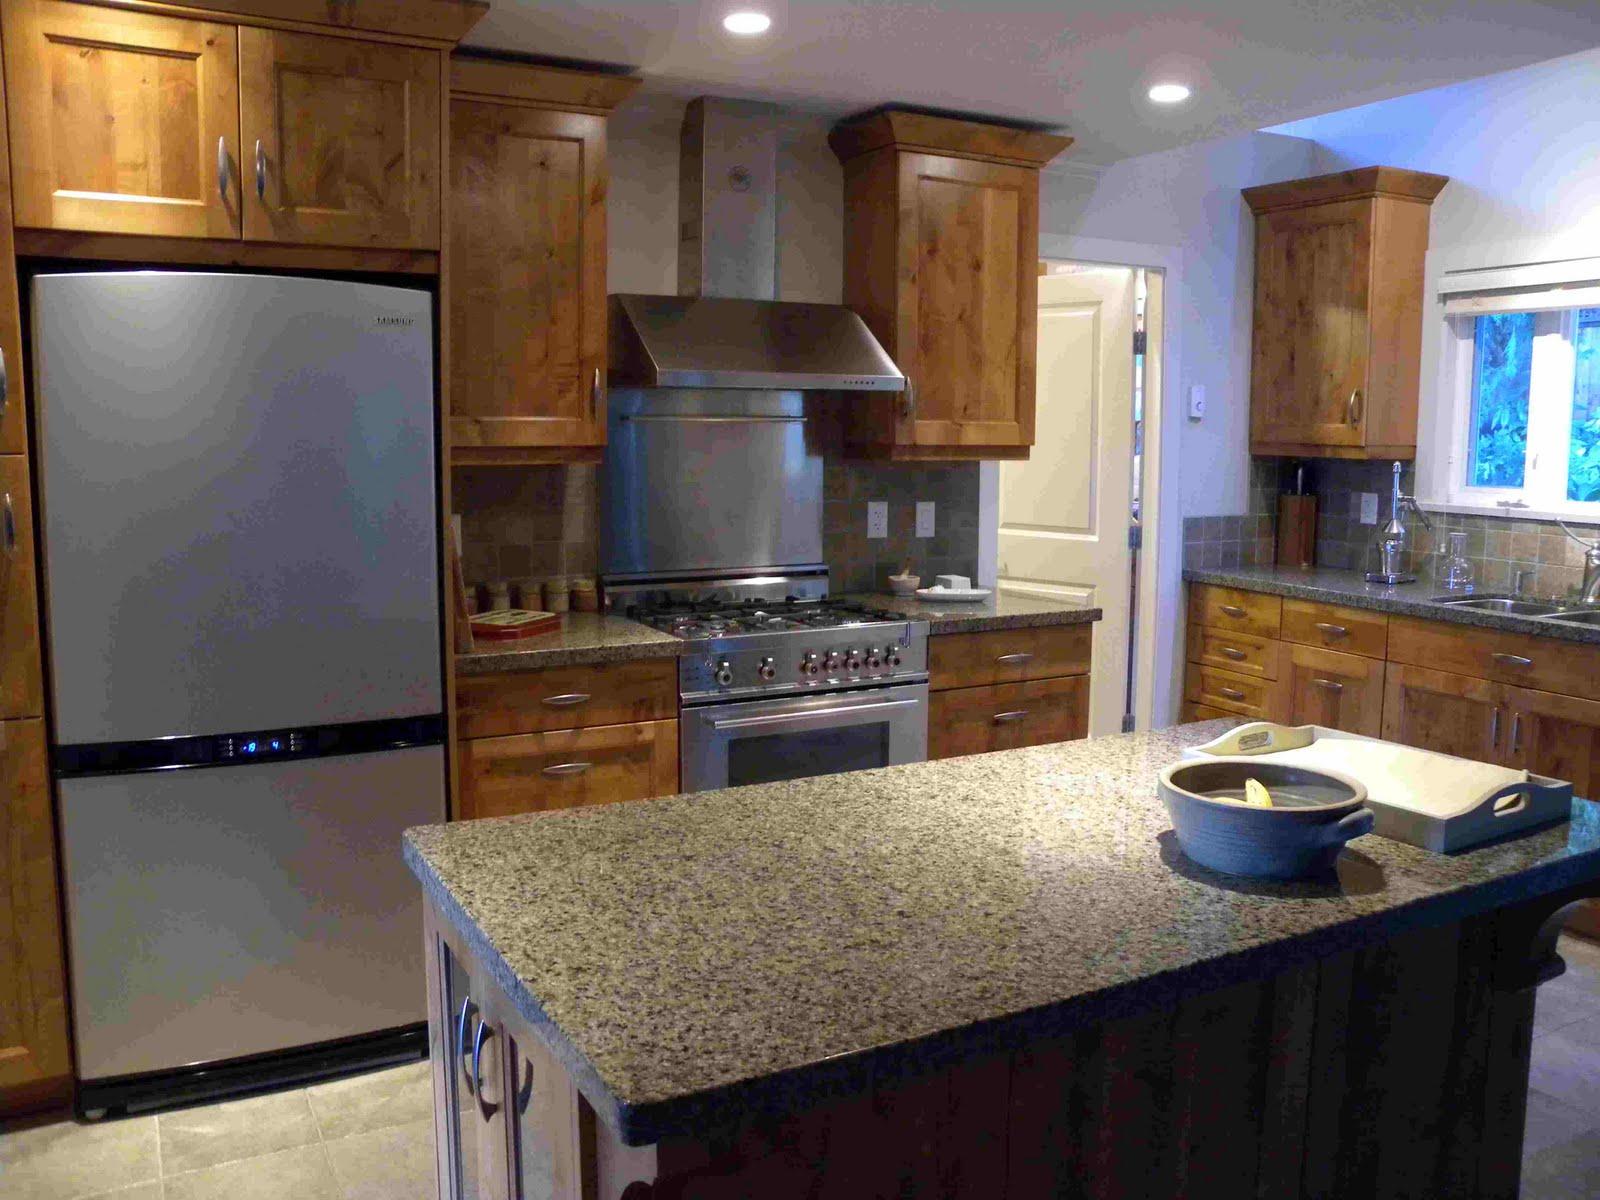 MCR Design Supply Build - Rénovations - 250-619-1223